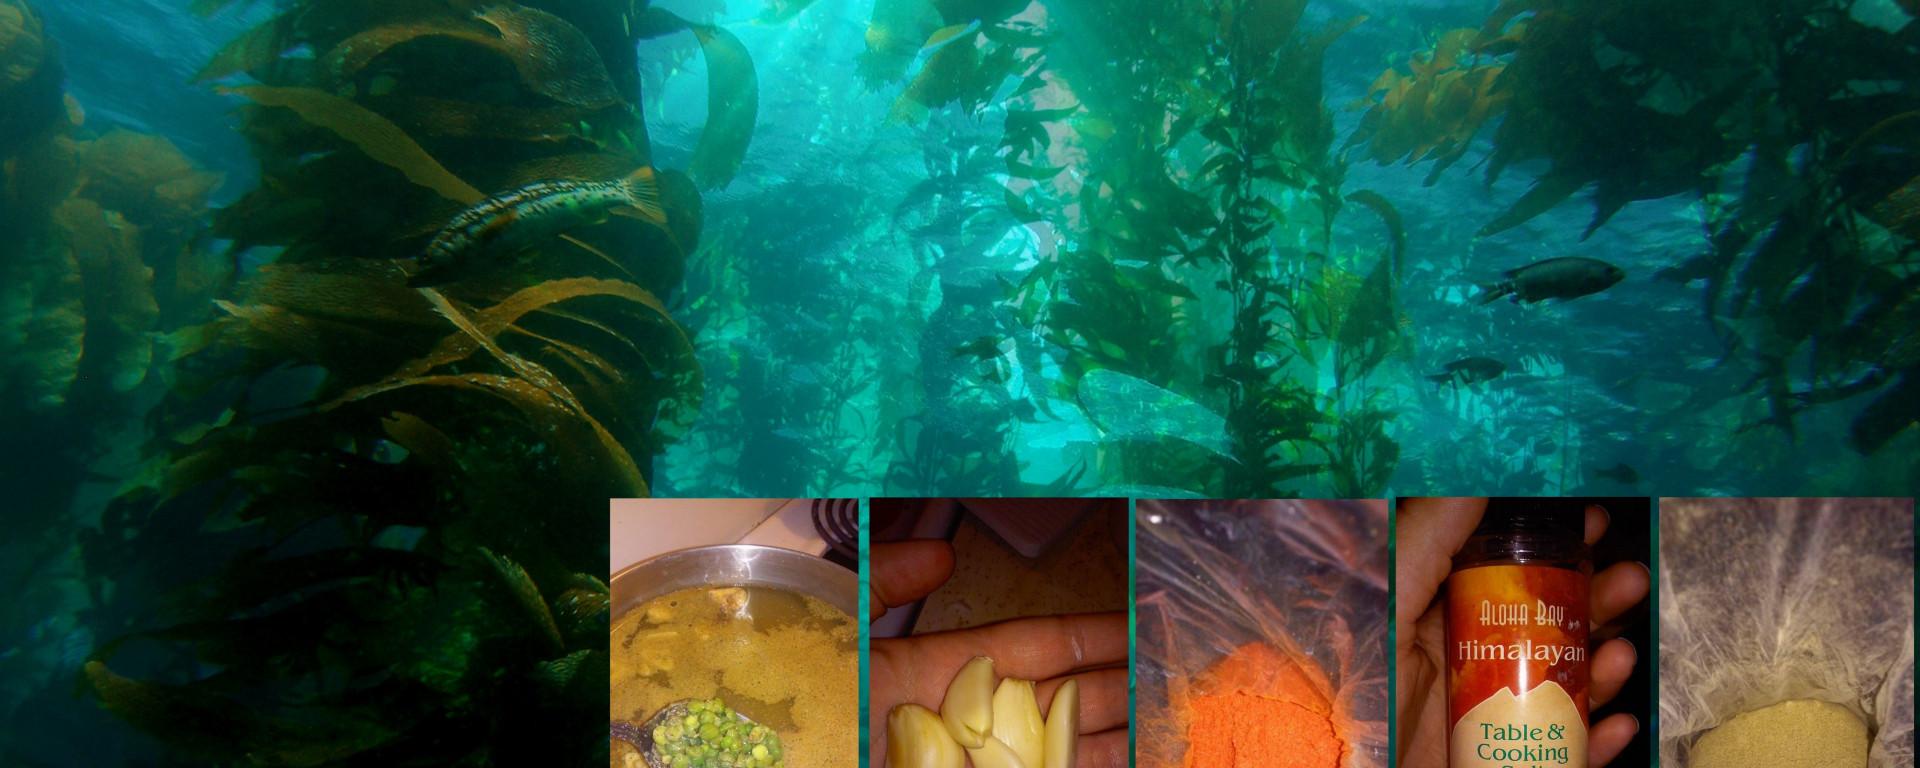 apple cider vinegar and thyroid kelp